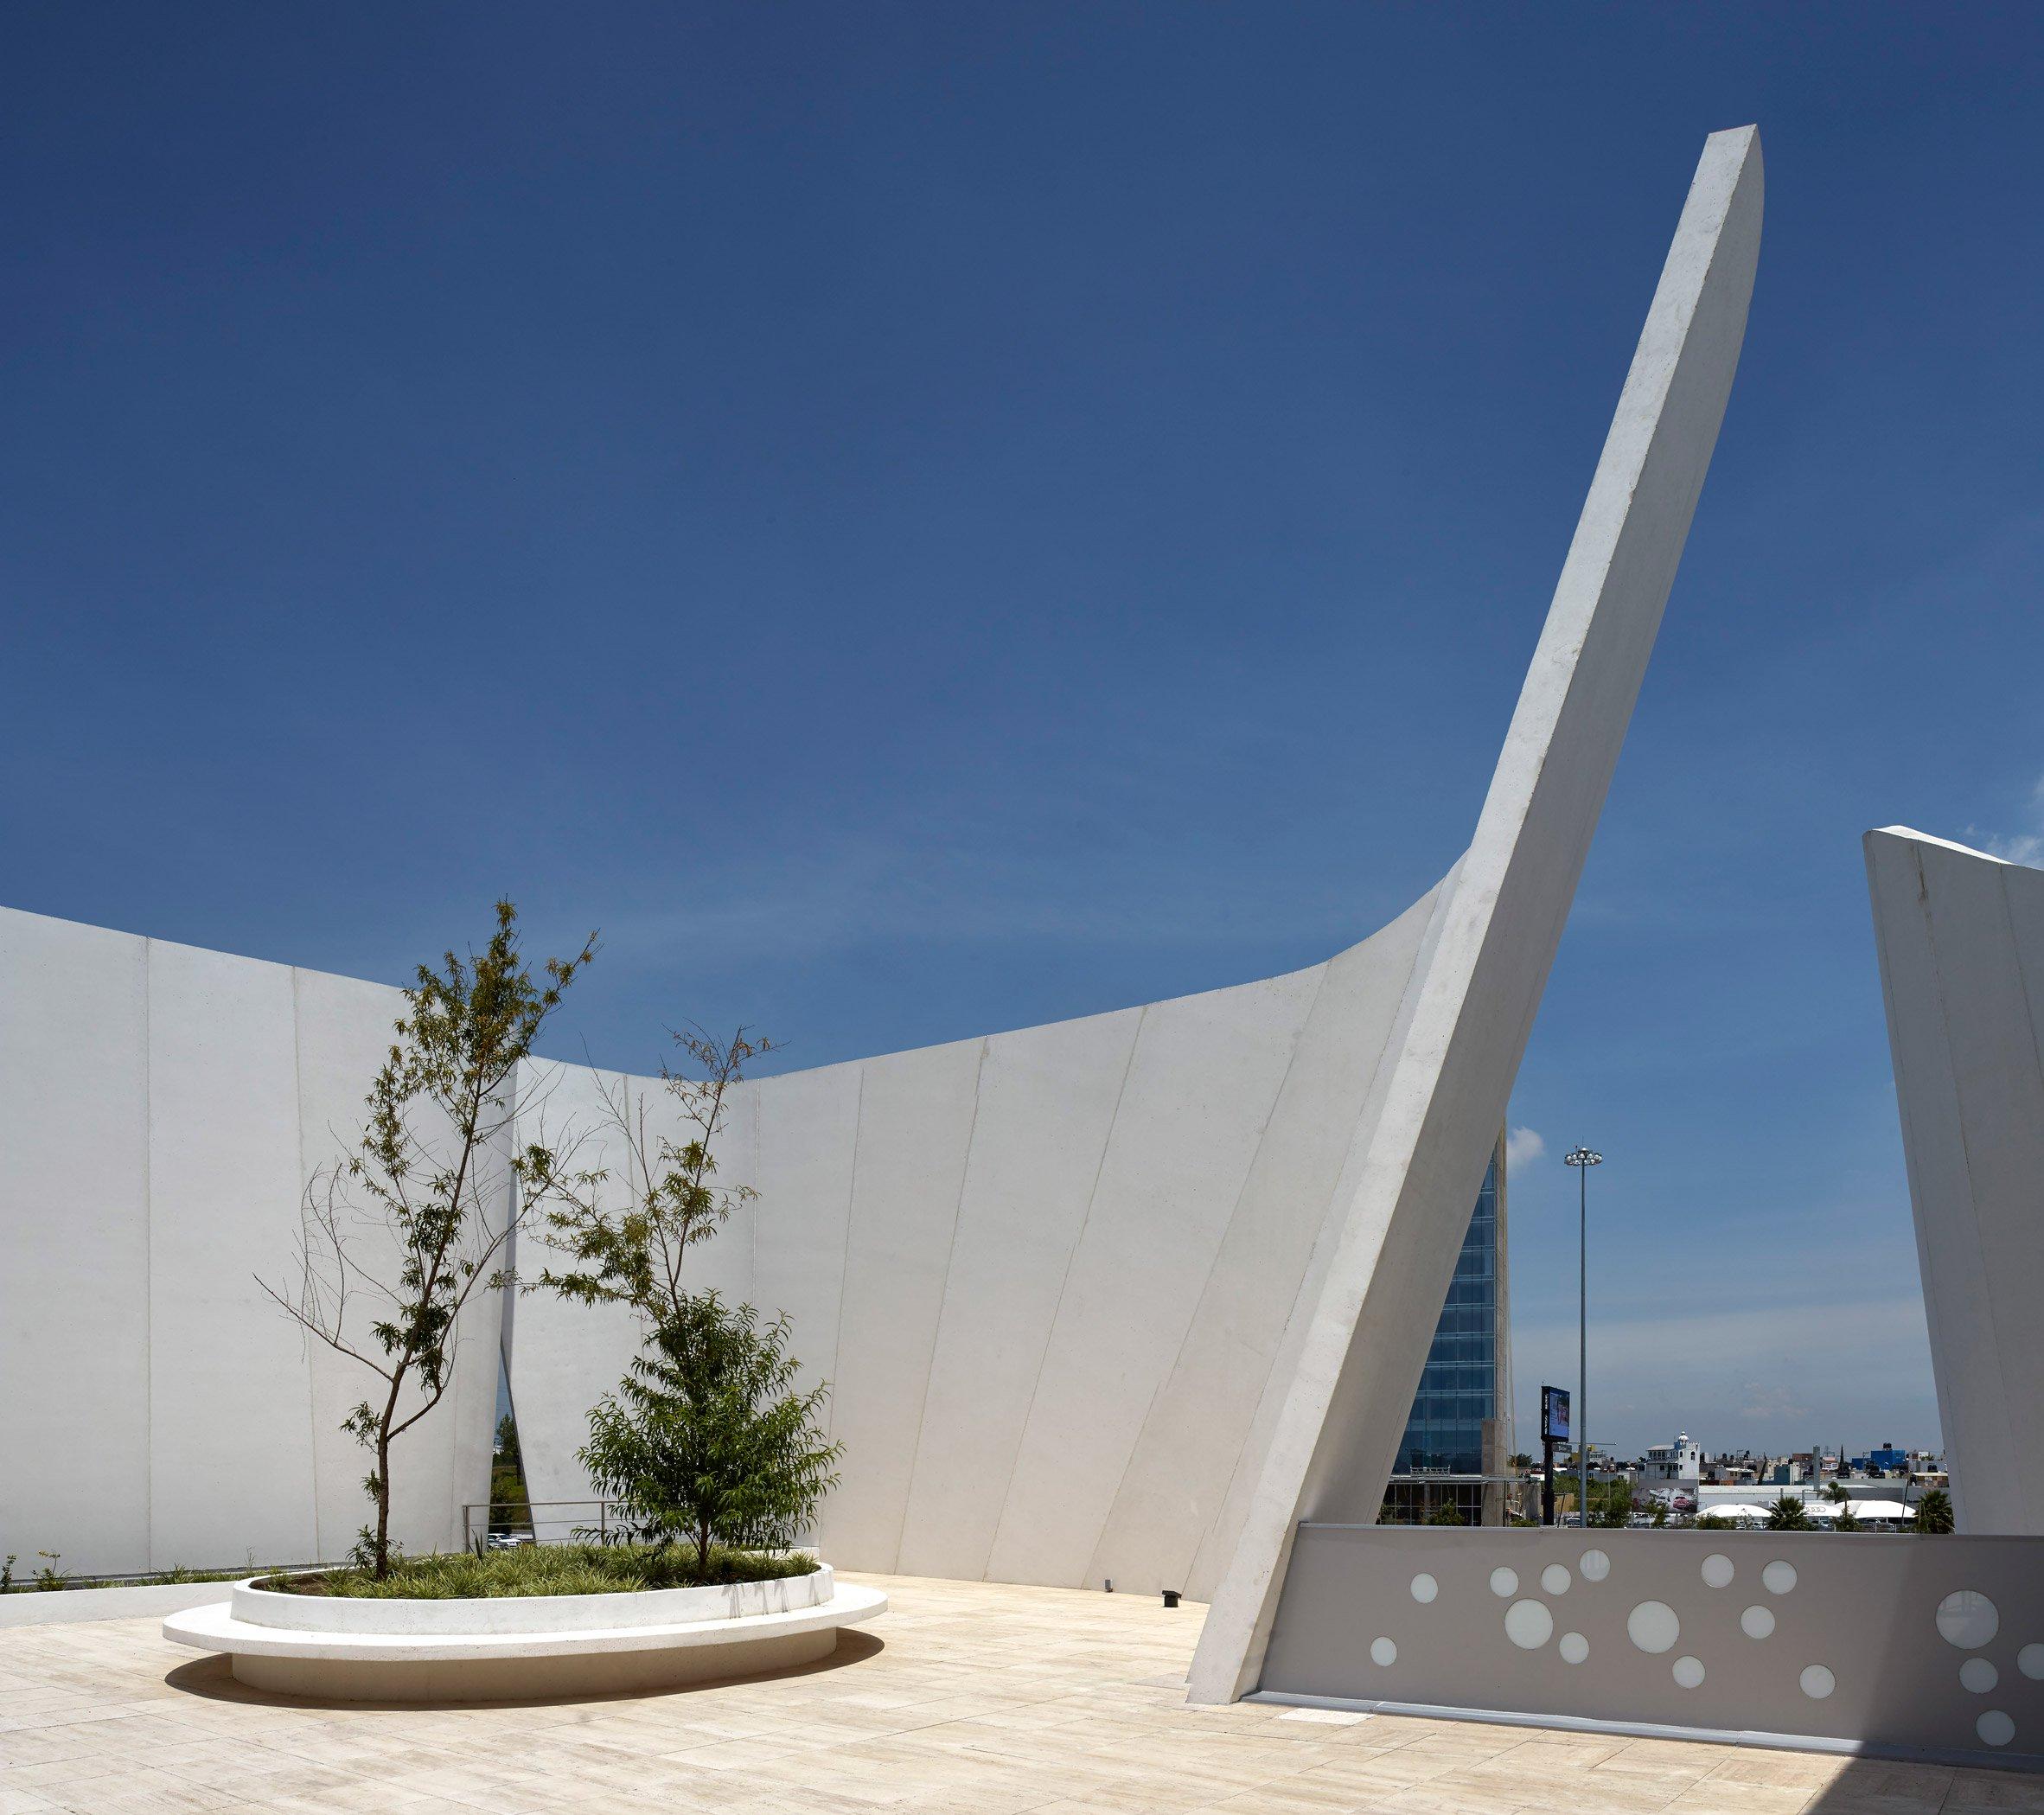 museo-internacional-del-barroco-cultural-architecture-museum-toyo-ito-peubla-mexico-architectural-photography-edmund-sumner_dezeen_2364_col_4